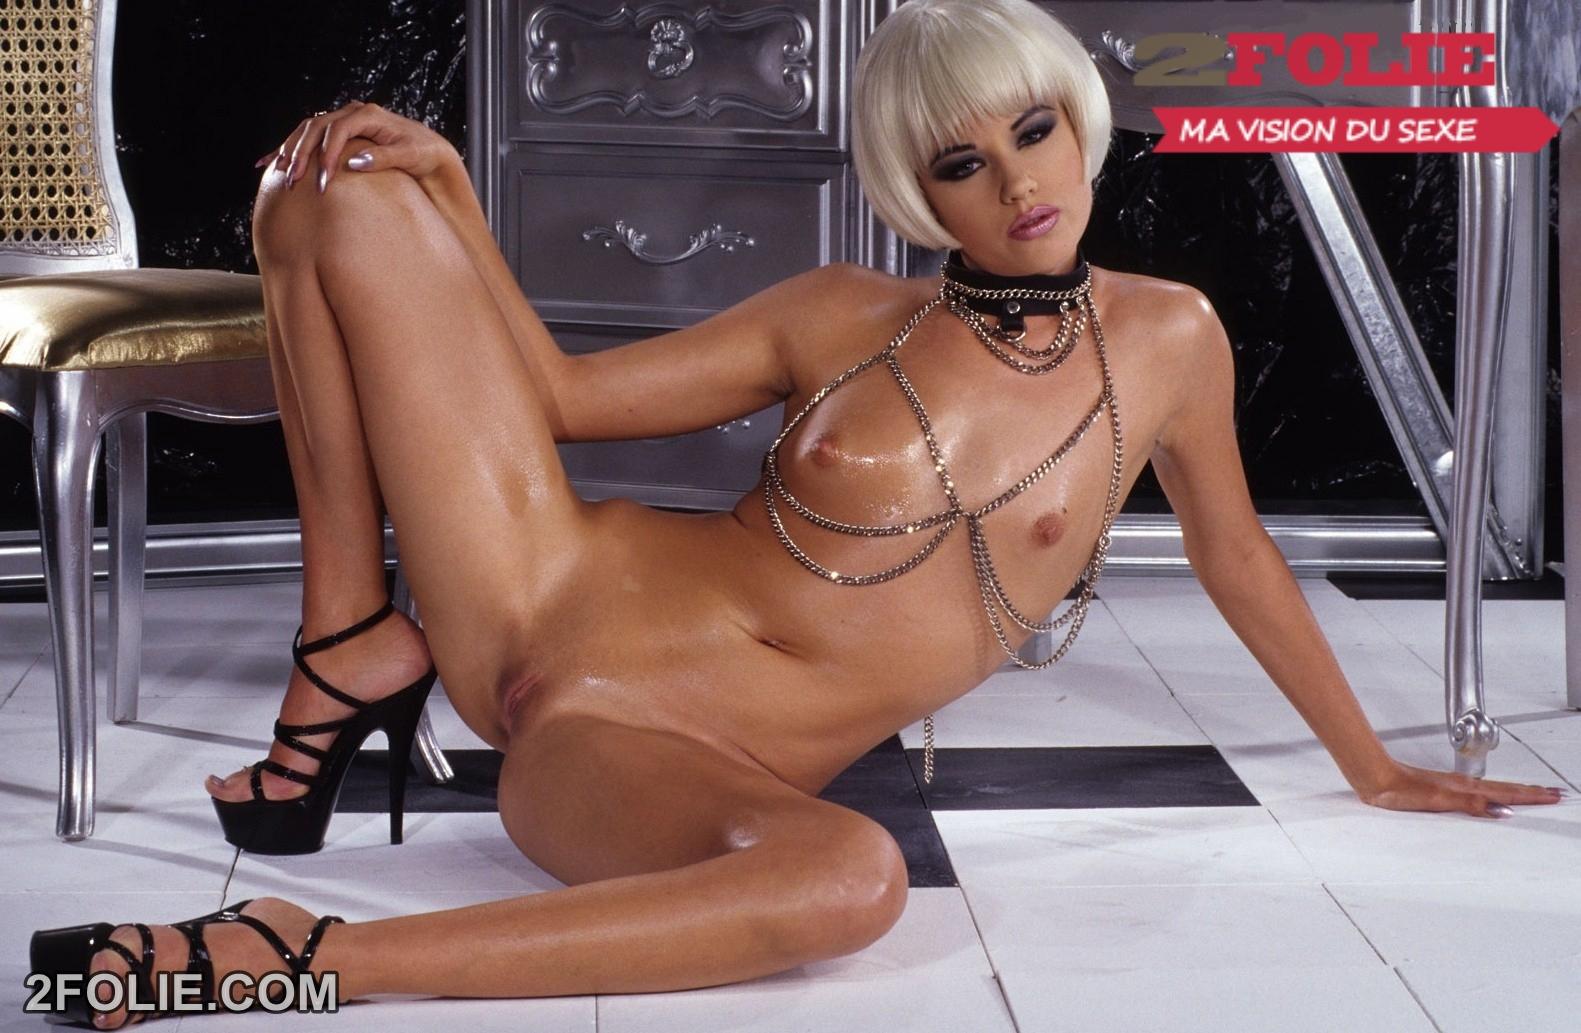 Porno jeunes femmes nues